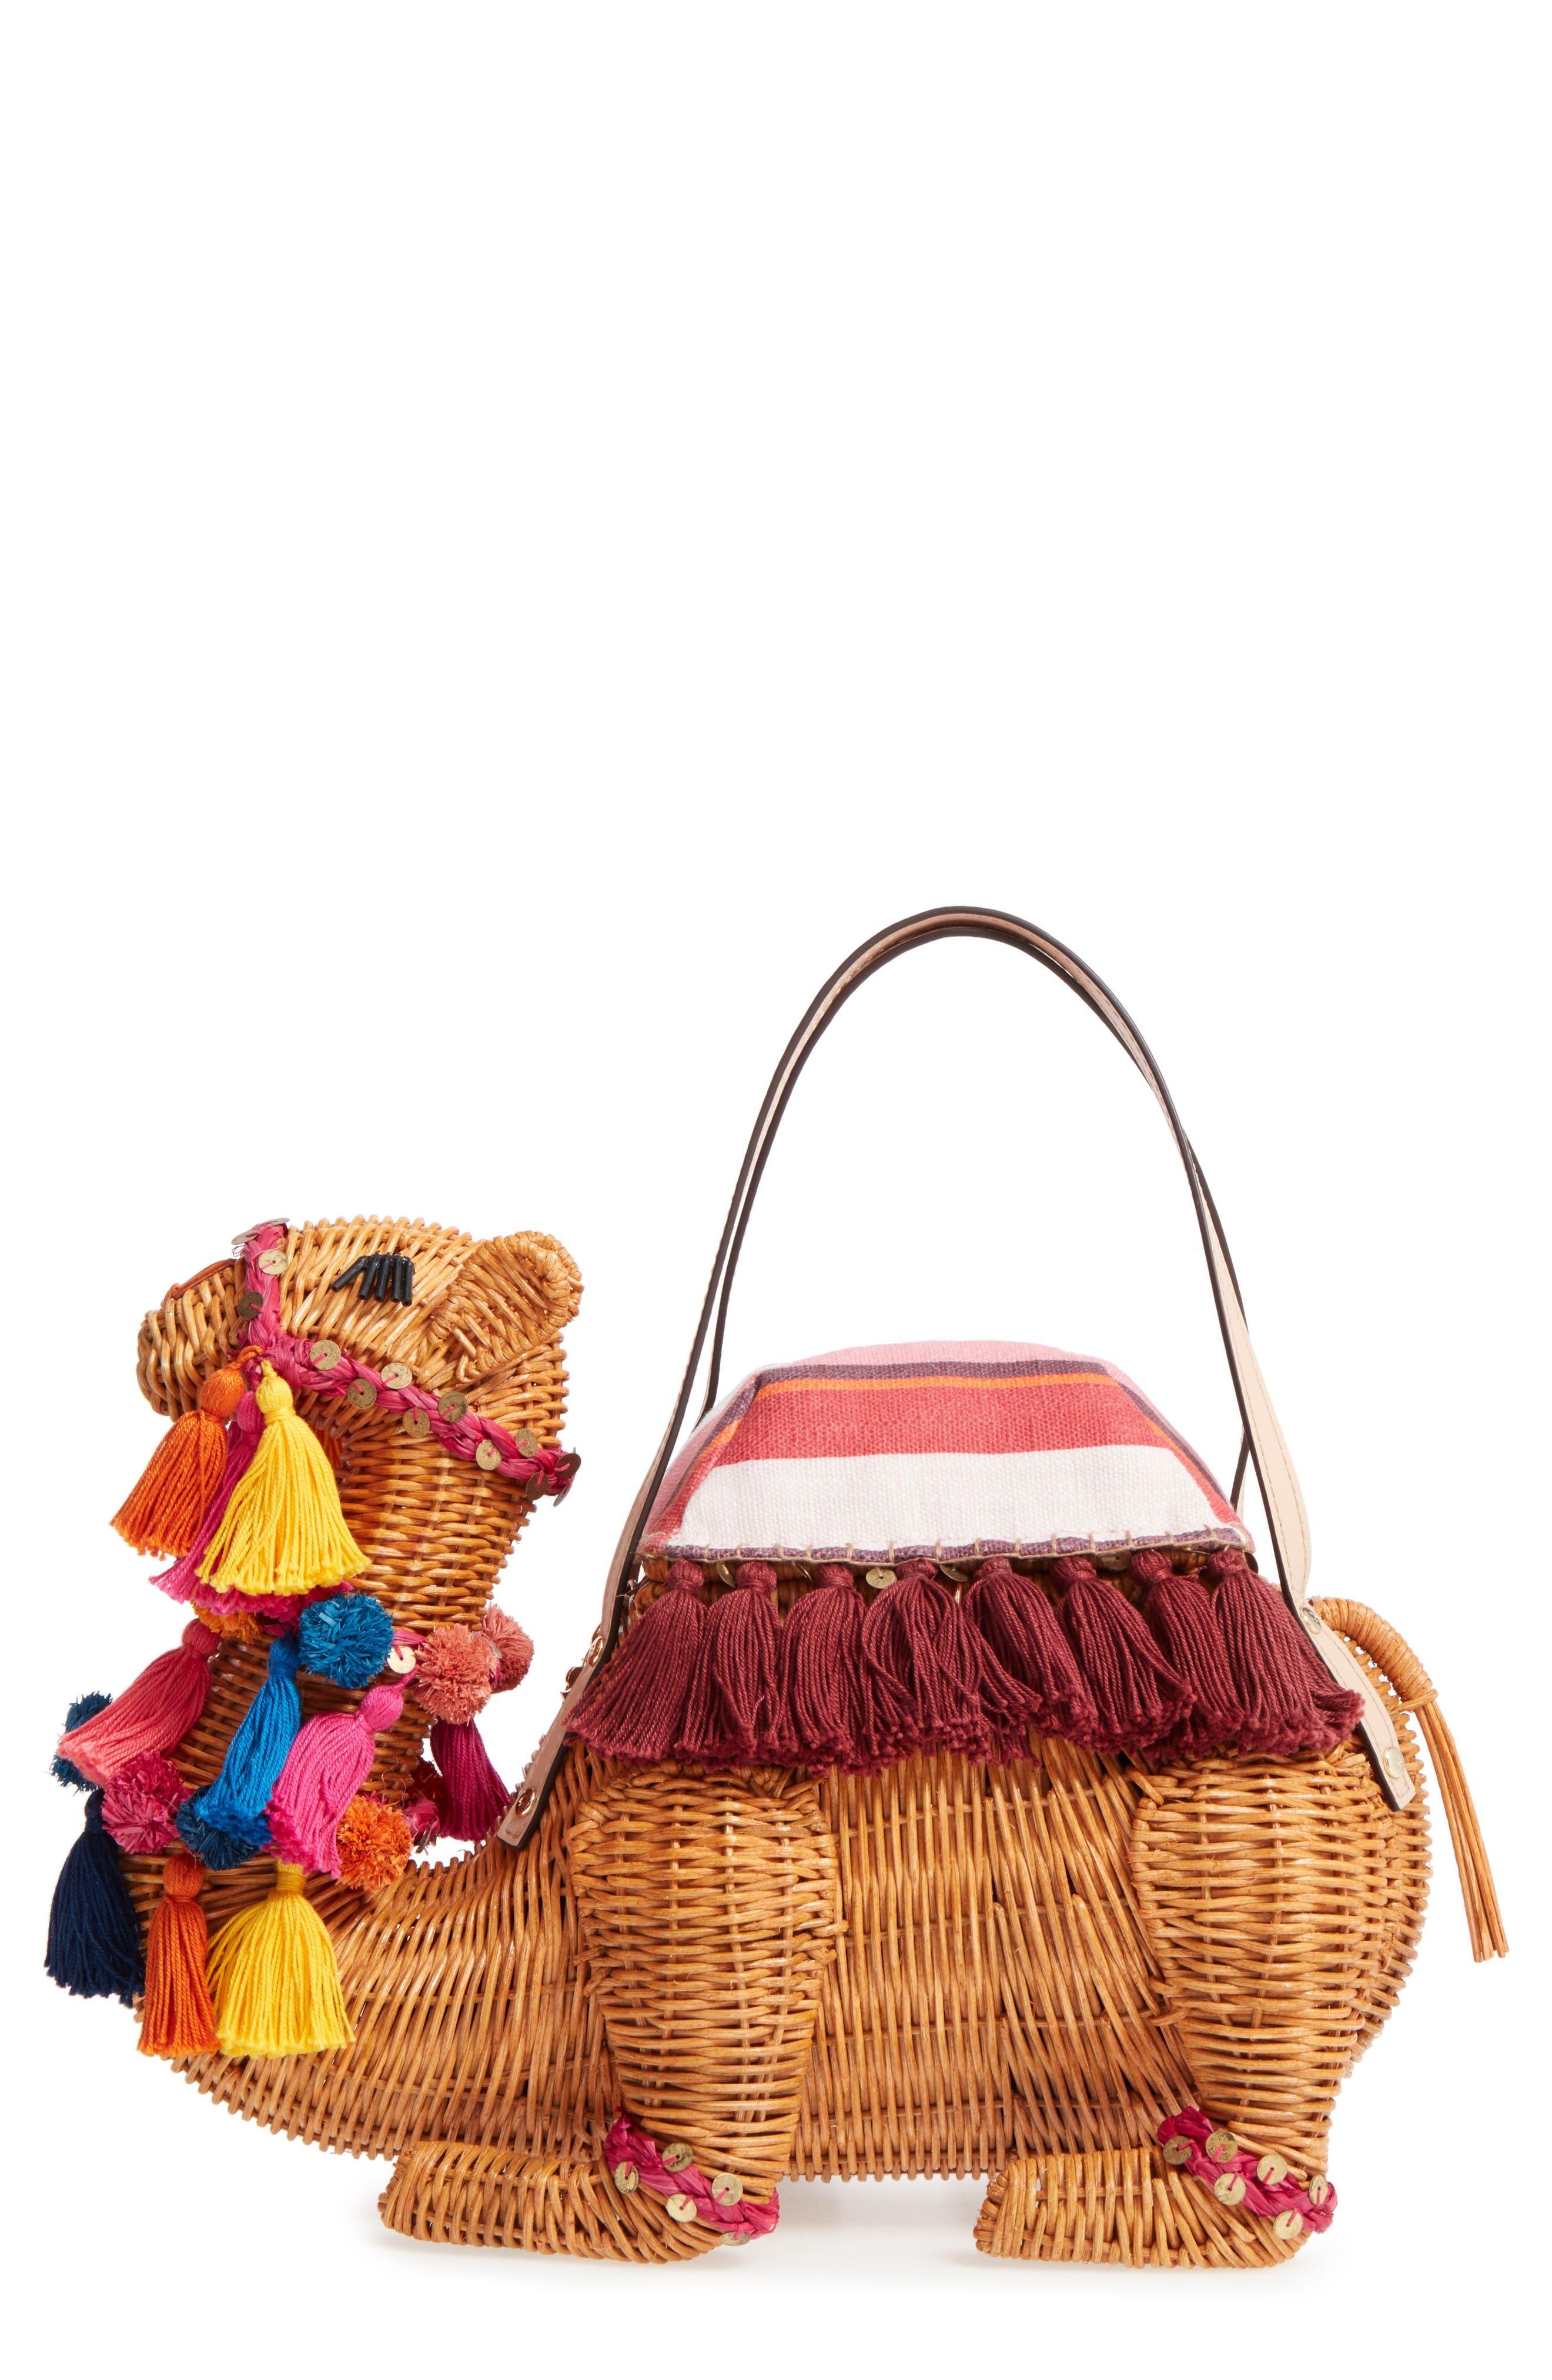 Alternate Image 1 Selected - kate spade new york spice things up wicker camel handbag